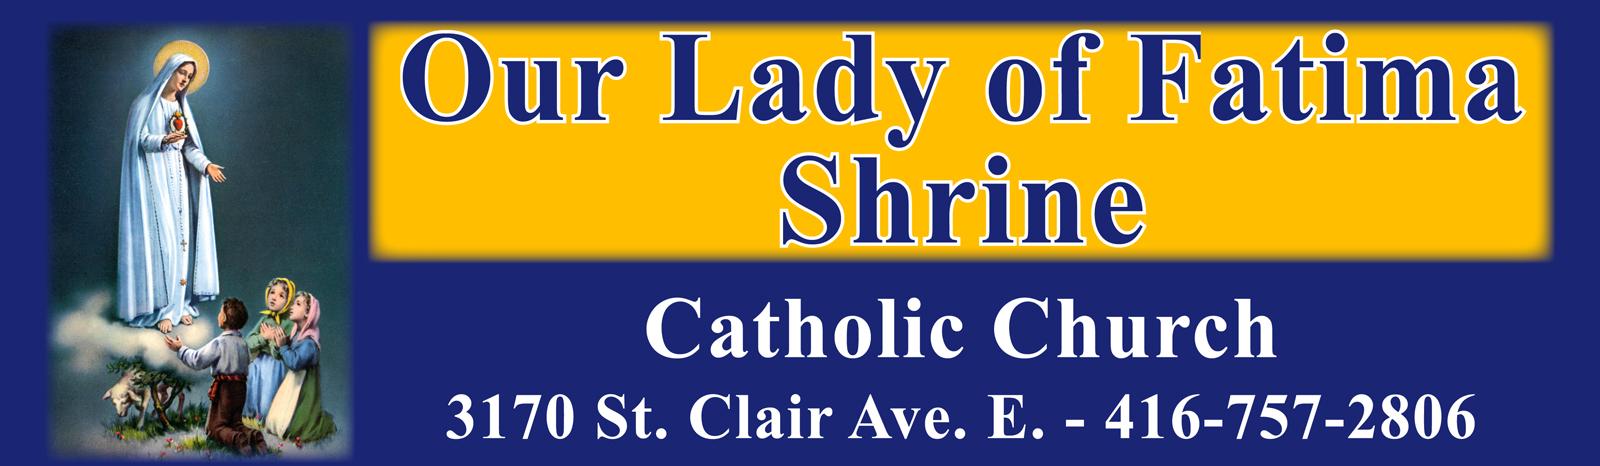 Catholic Church Sign